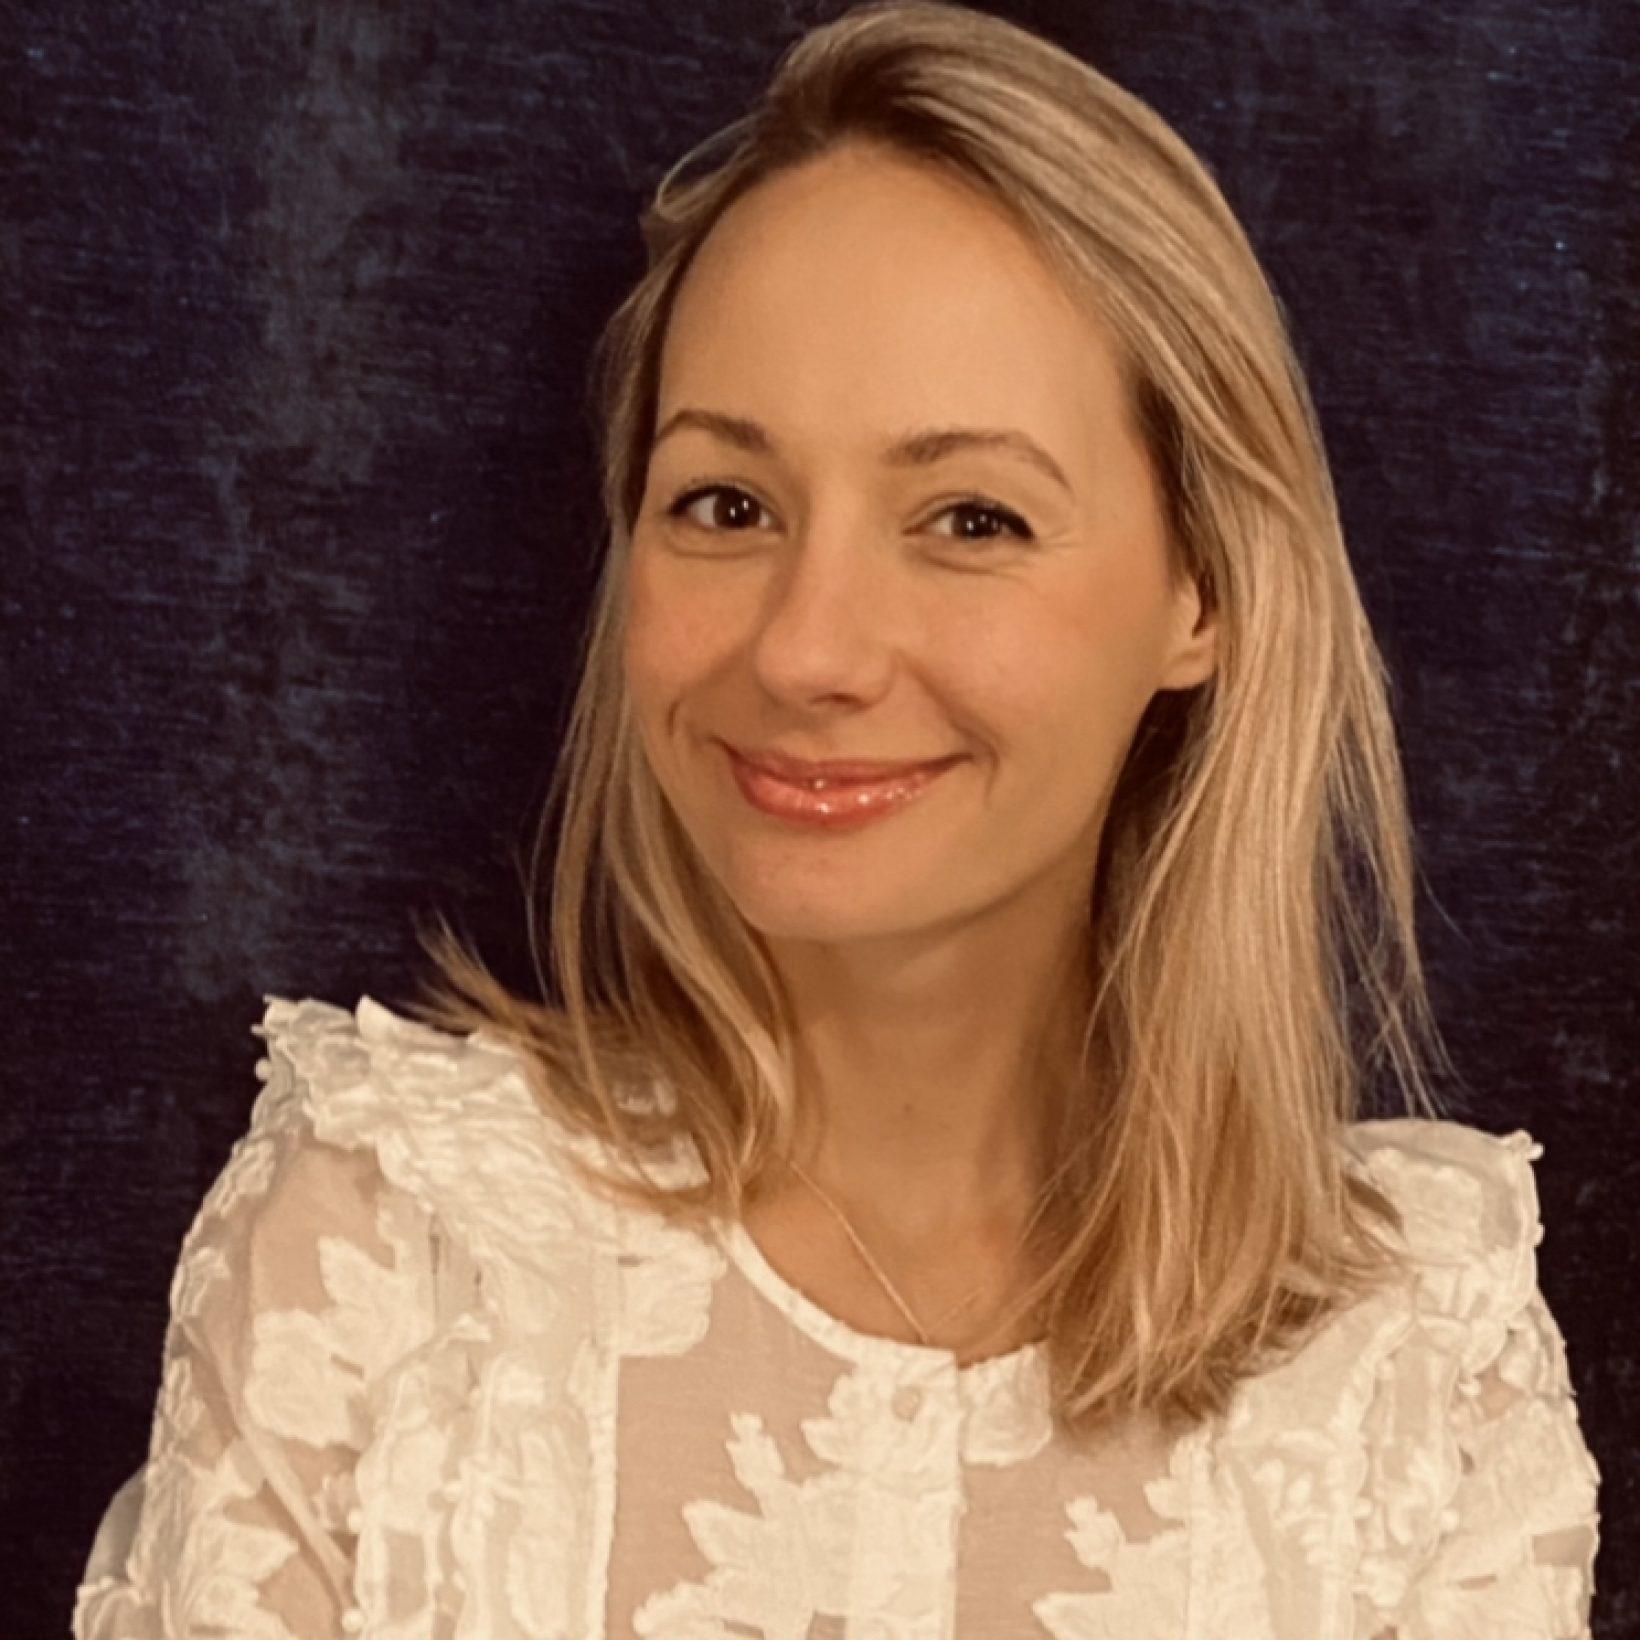 Vanda Absolonova